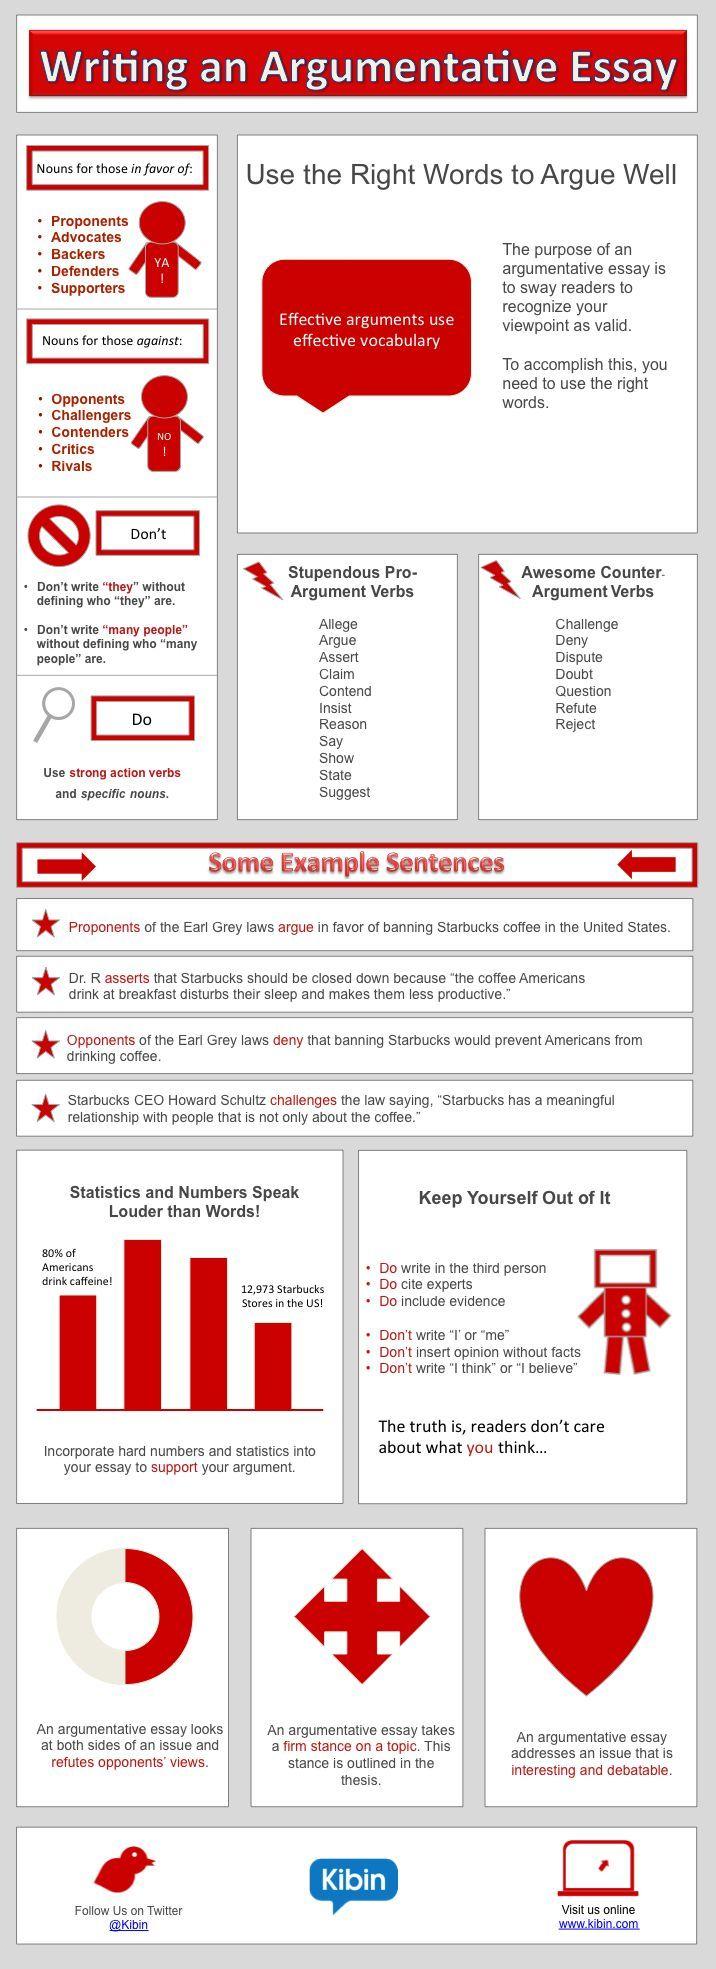 best argumentative essay ideas argumentative an infographic to teach you the hacks to write argumentative essays